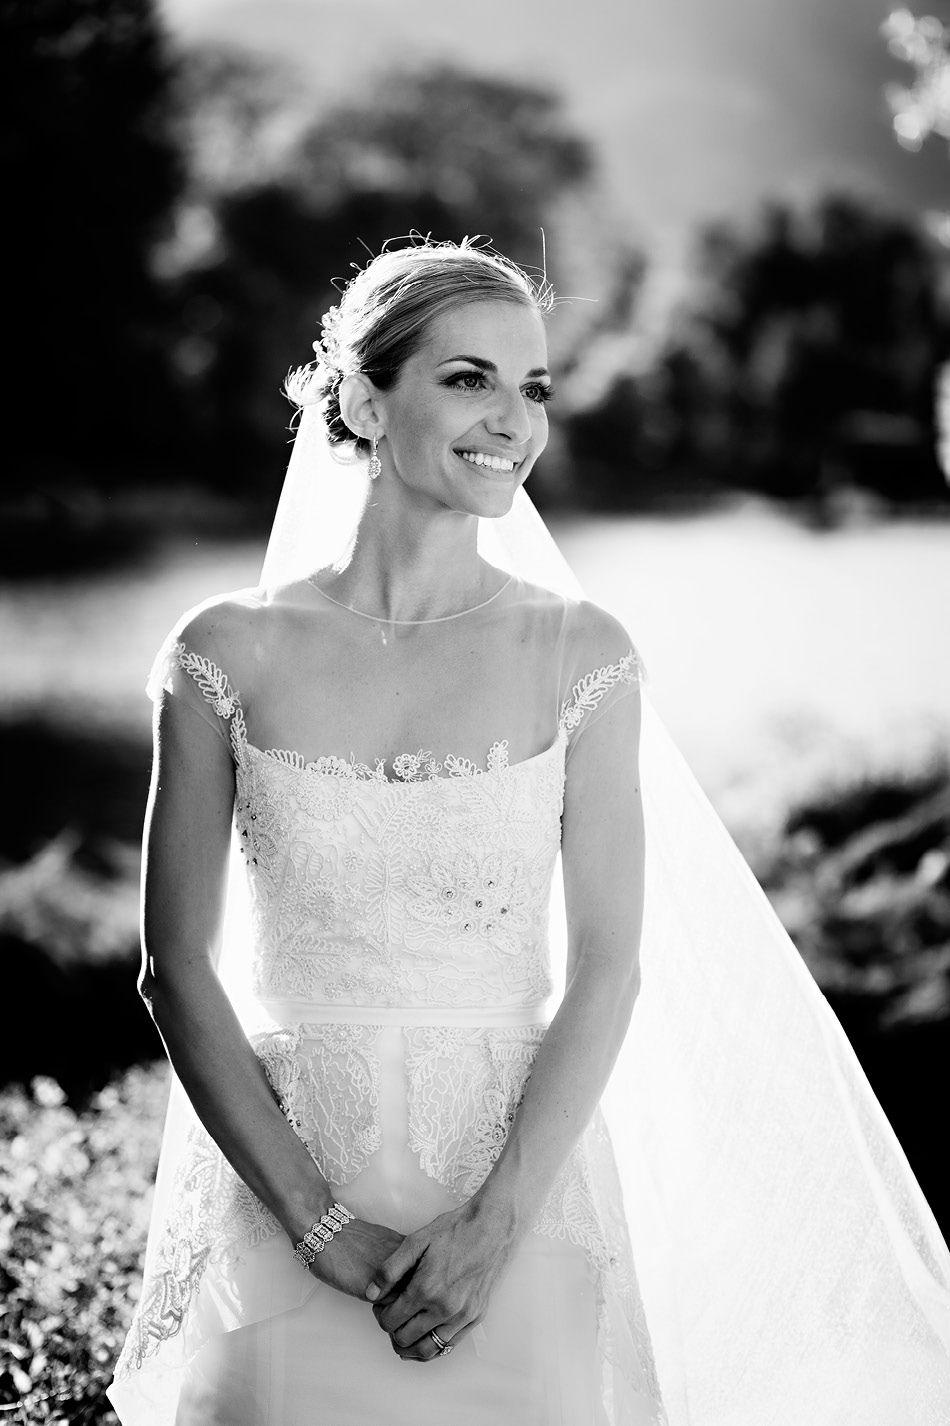 Wedding Photography at the Broadmoor in Colorado Springs